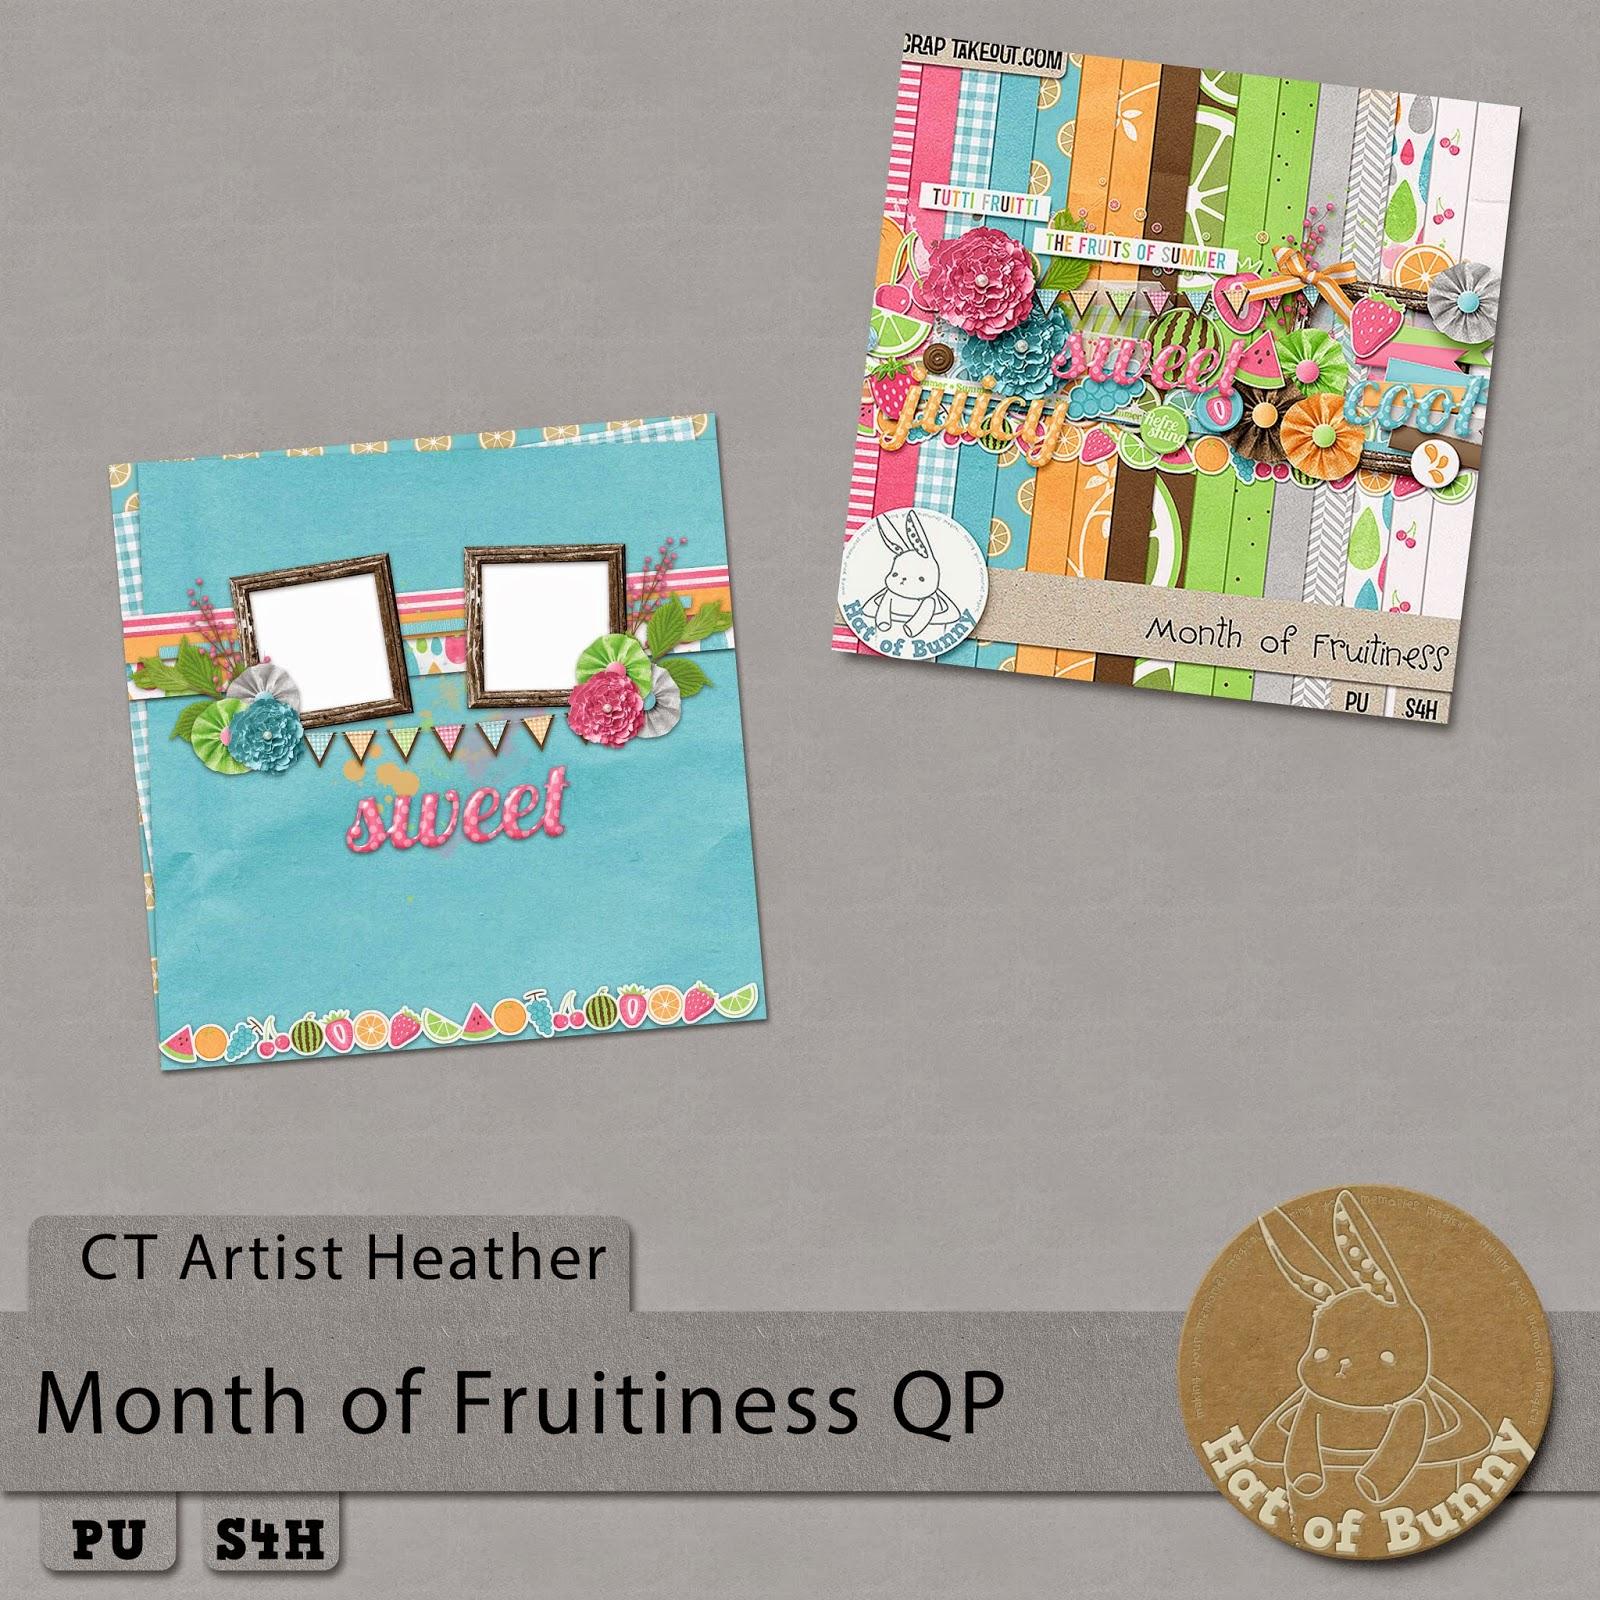 http://www.mediafire.com/download/6pqasojjaqvrec6/Month_of_Fruitiness_QP.zip